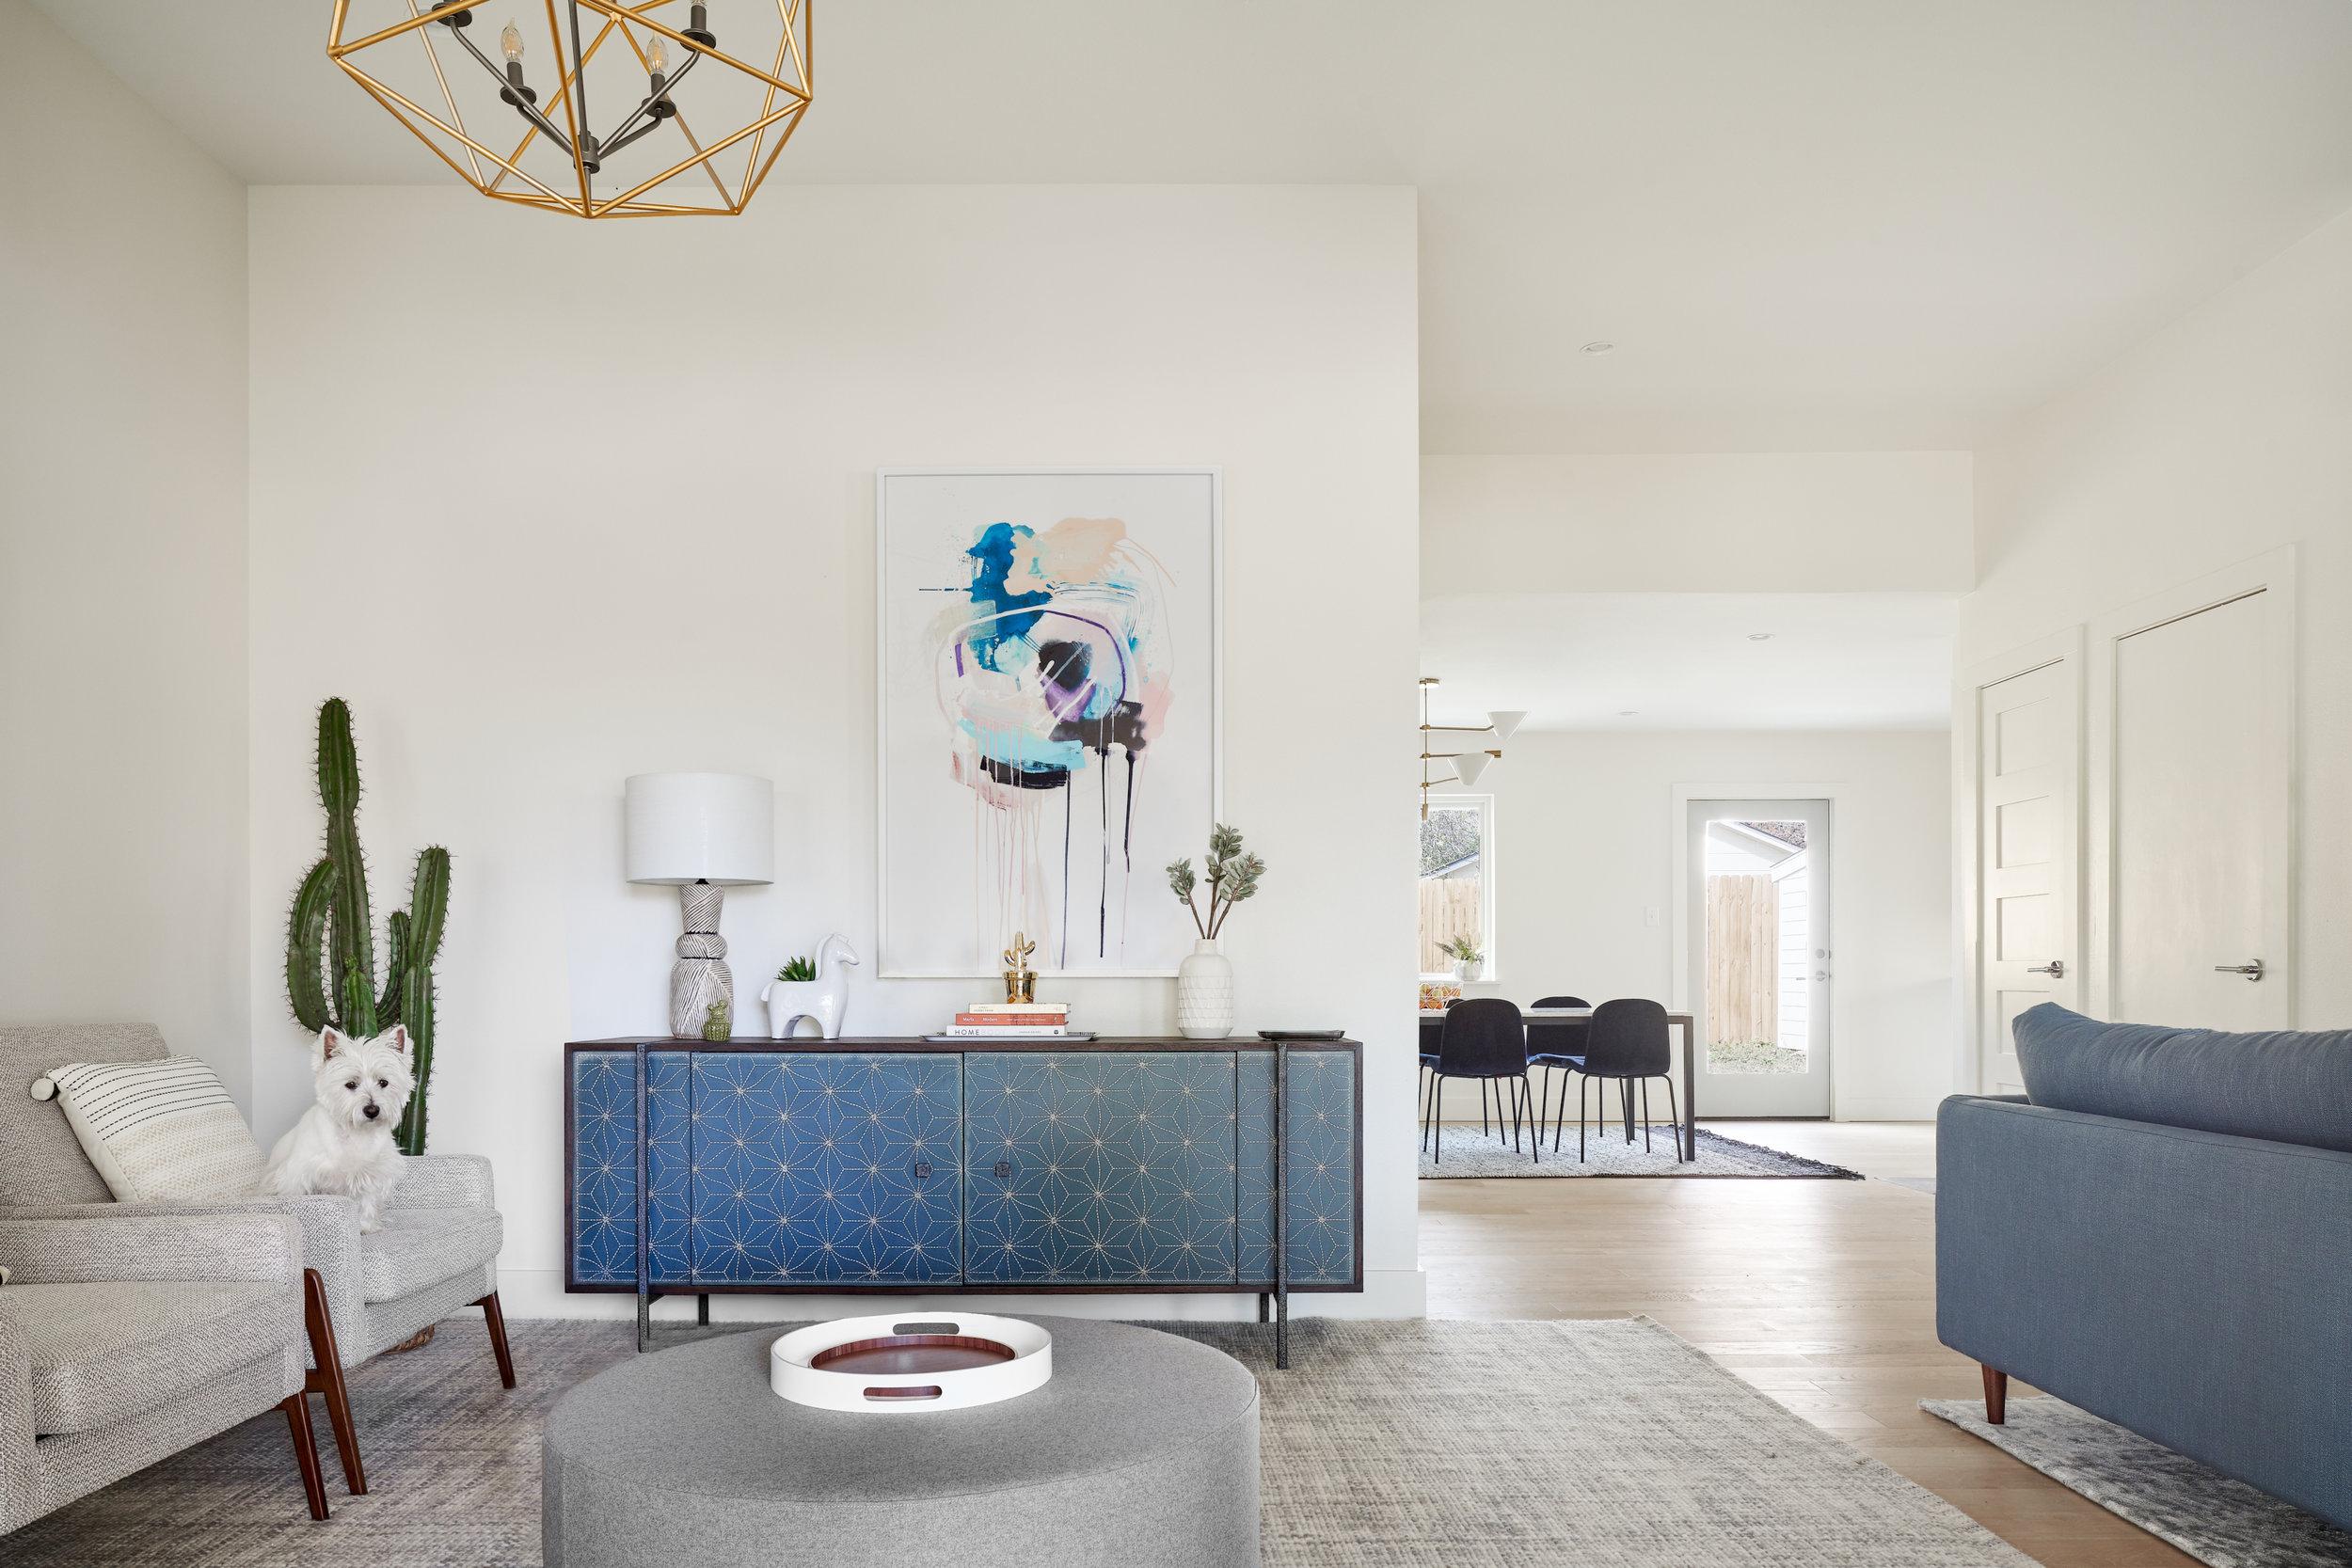 Furnish— - Mood & Concept BoardsRoom LayoutsItemized Furniture Selections